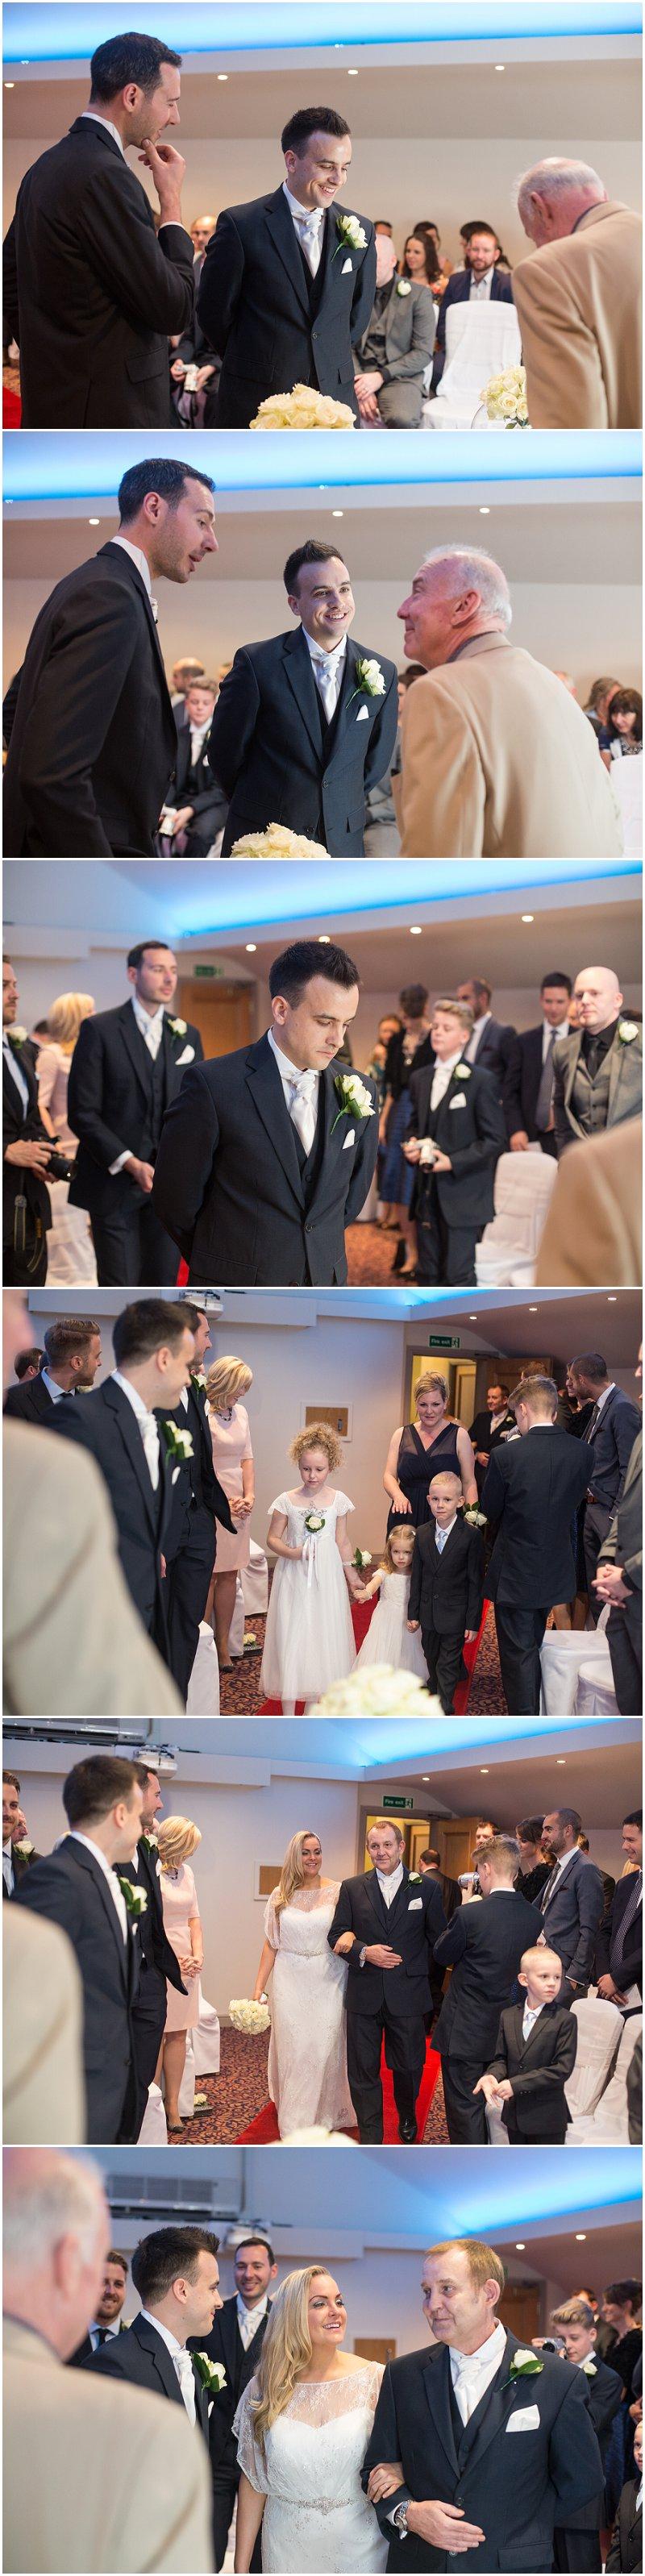 Wedding ceremony at Red Hall Bury